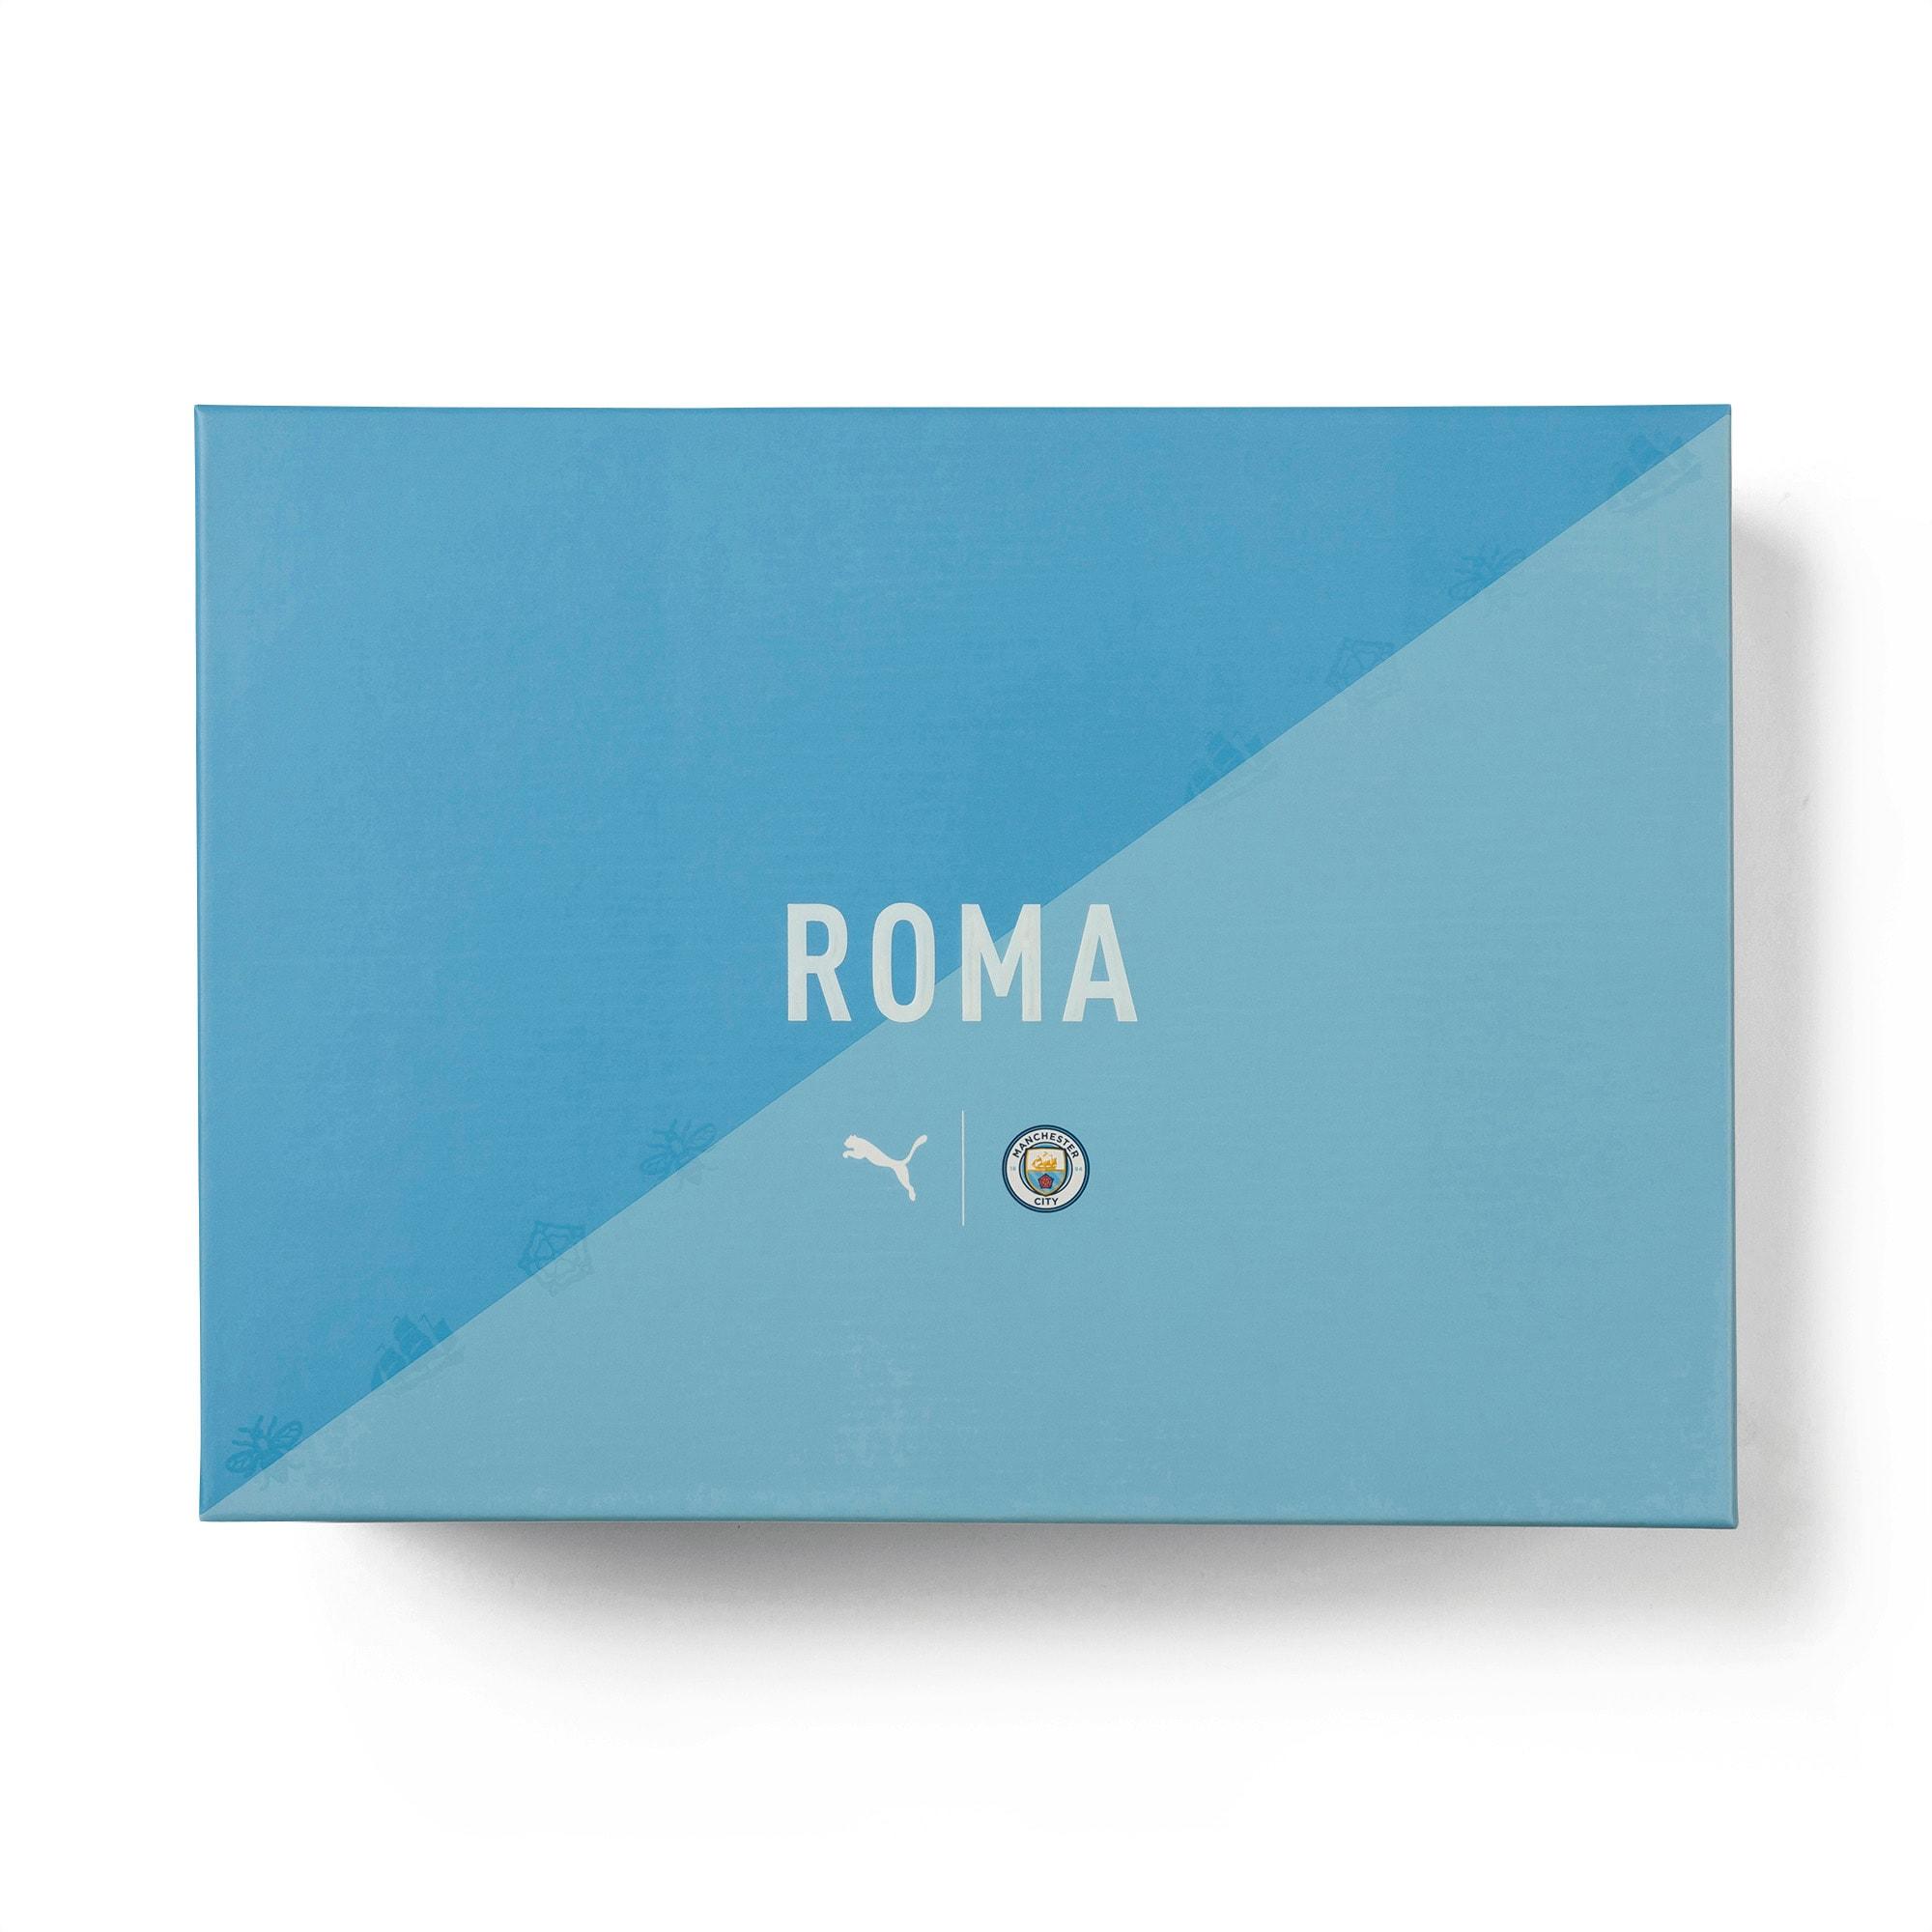 Buty sportowe Roma x Manchester City